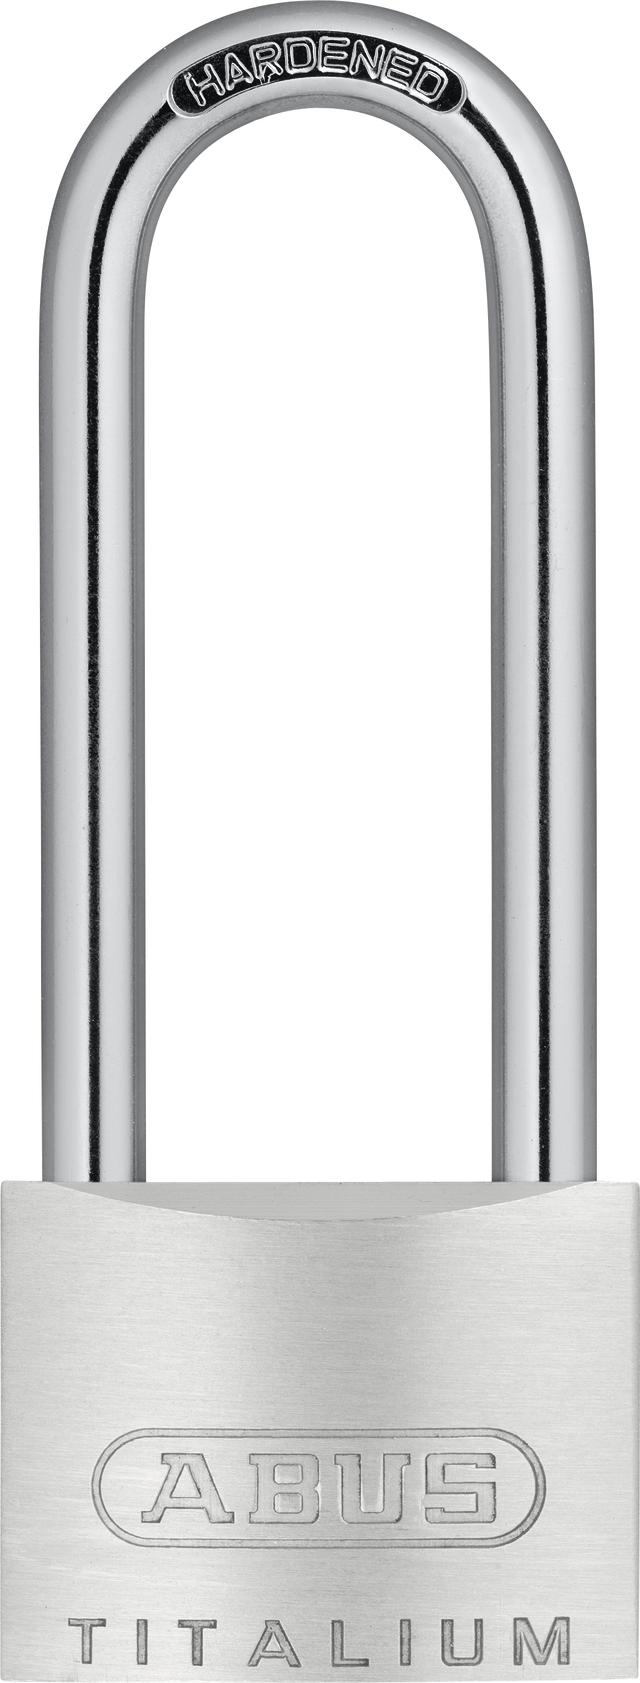 Vorhangschloss 54TI/40HB63 Lock-Tag